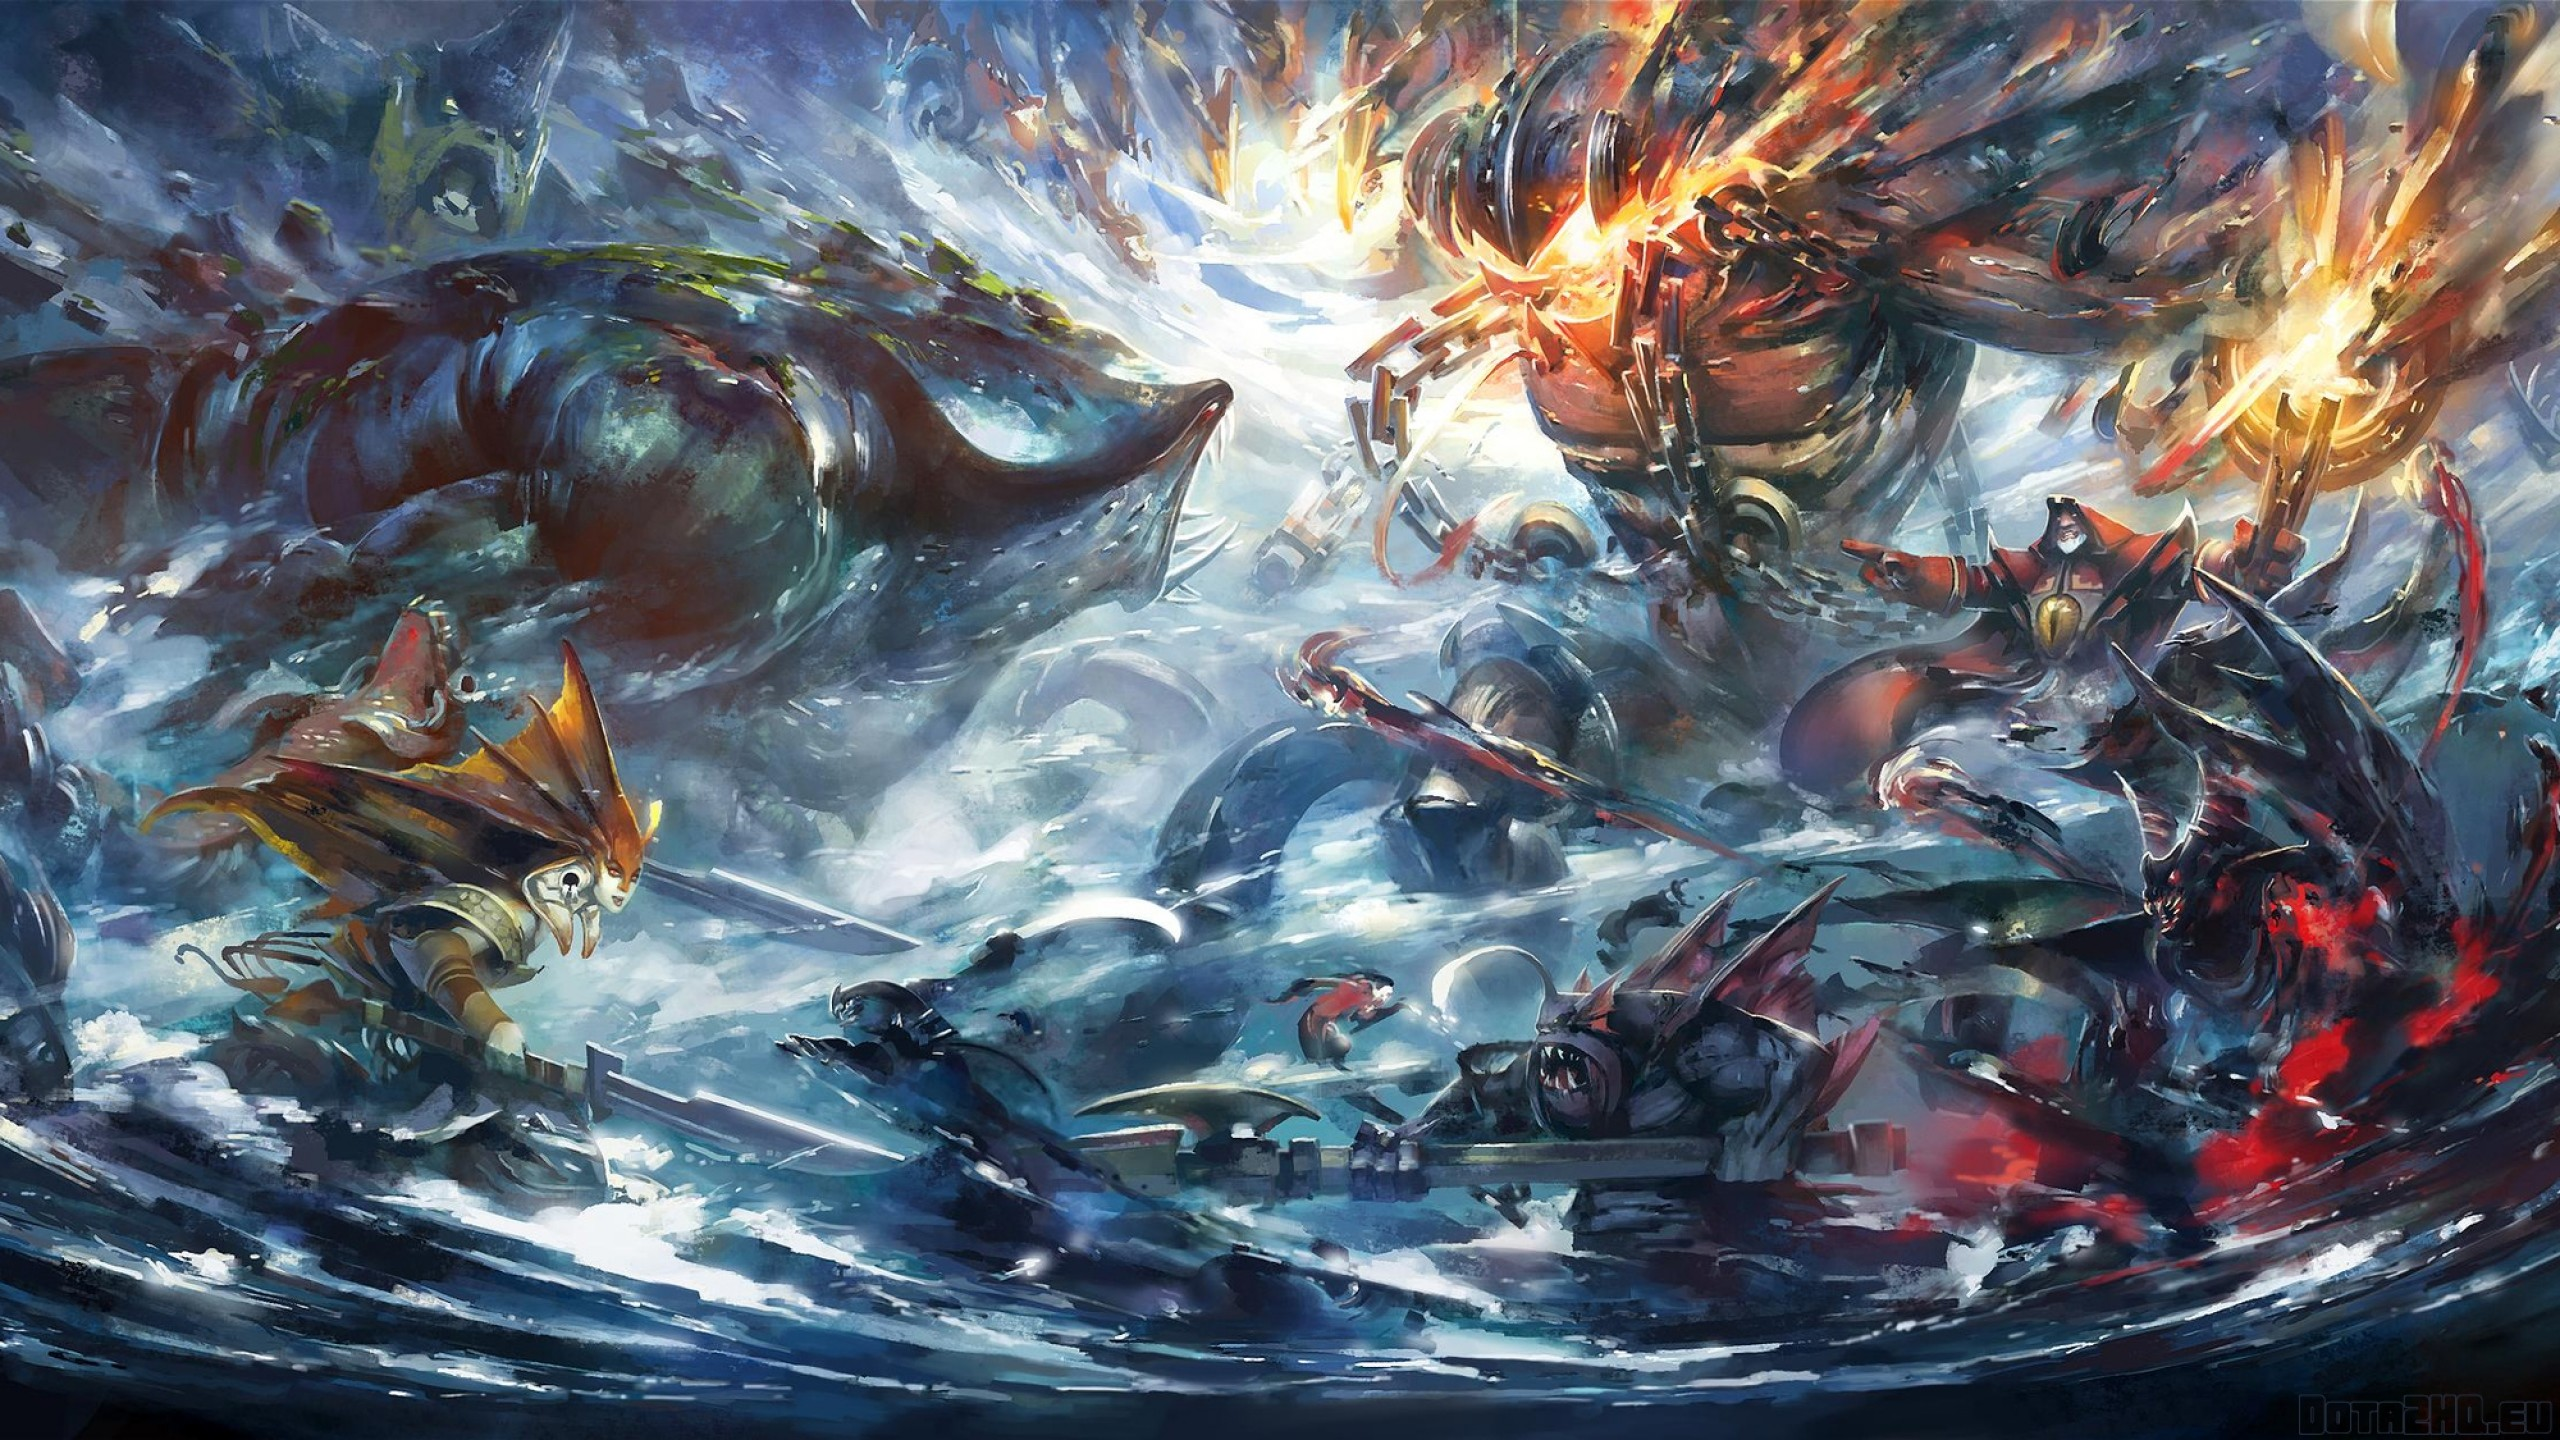 Wallpaper dota 2, epic battle, art